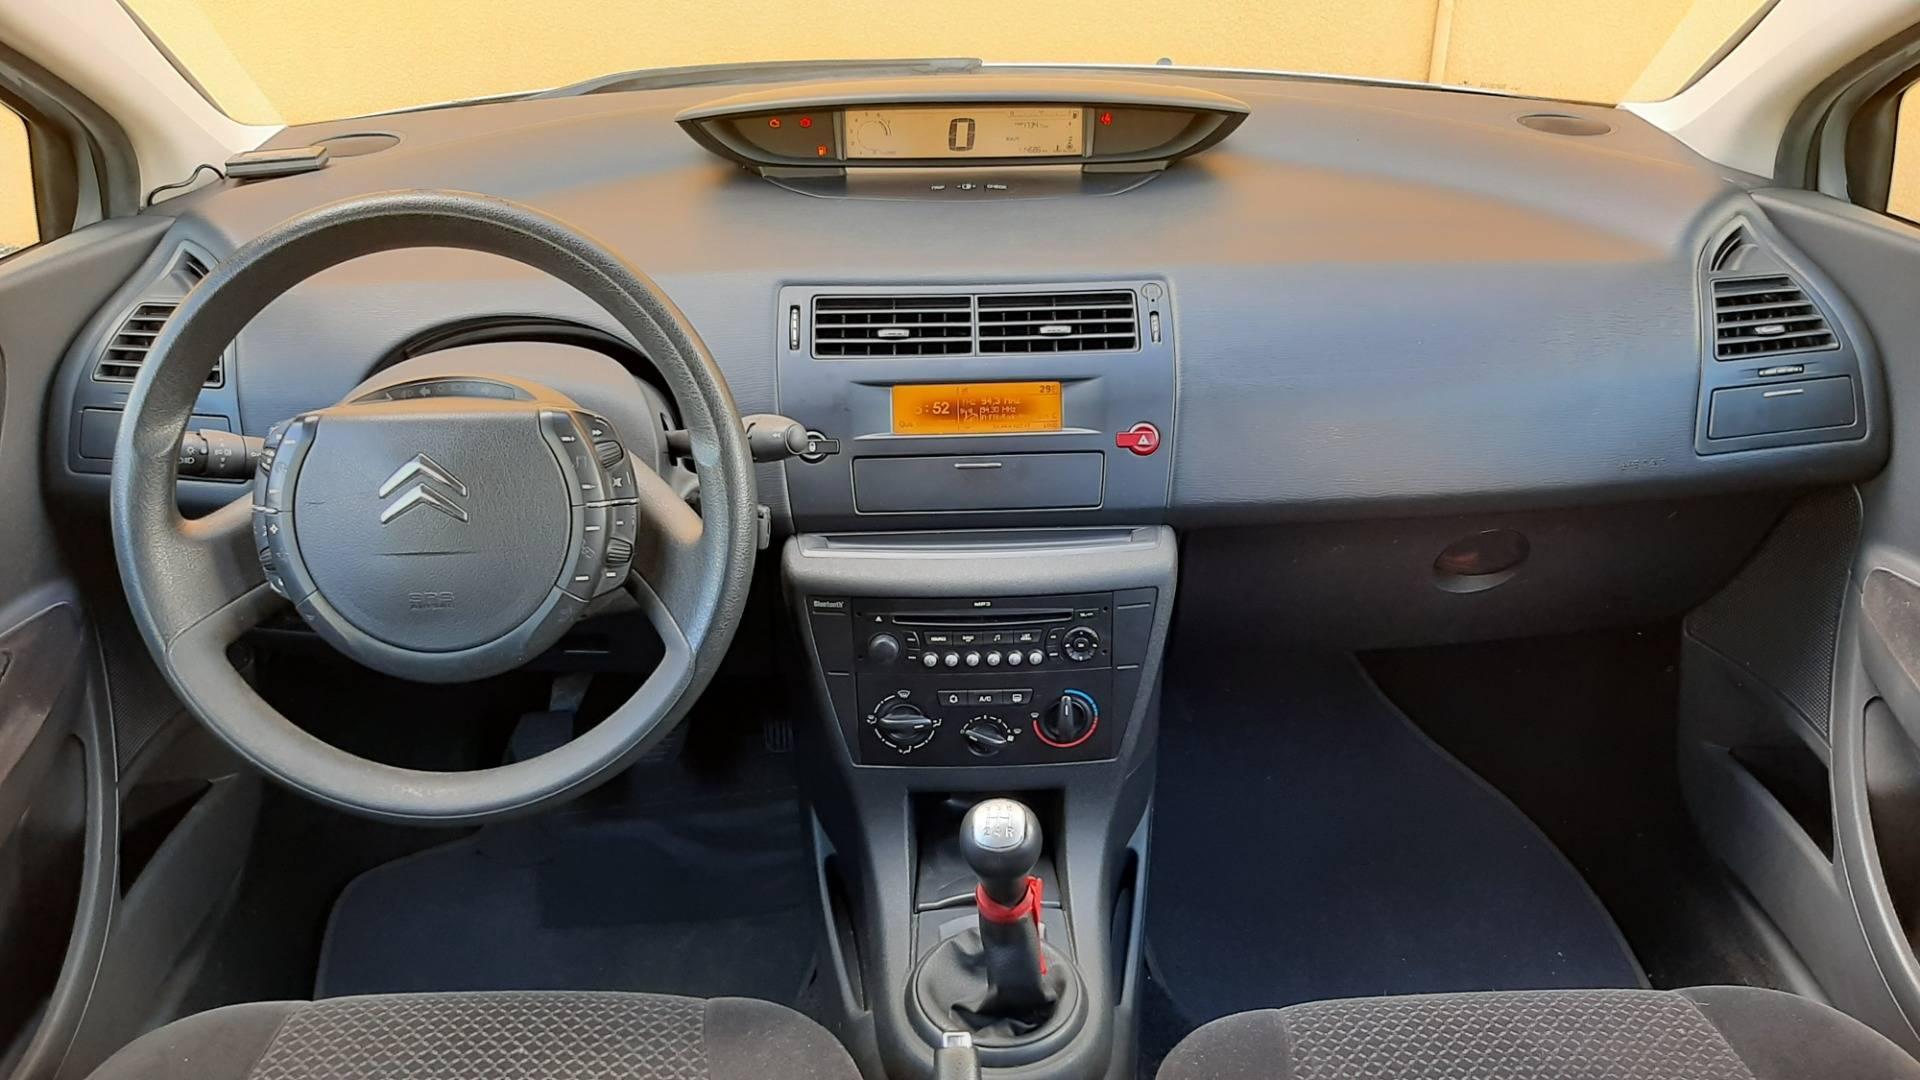 CITROEN C4 Sedan 2.0 16V 4P GLX PALLAS FLEX, Foto 7